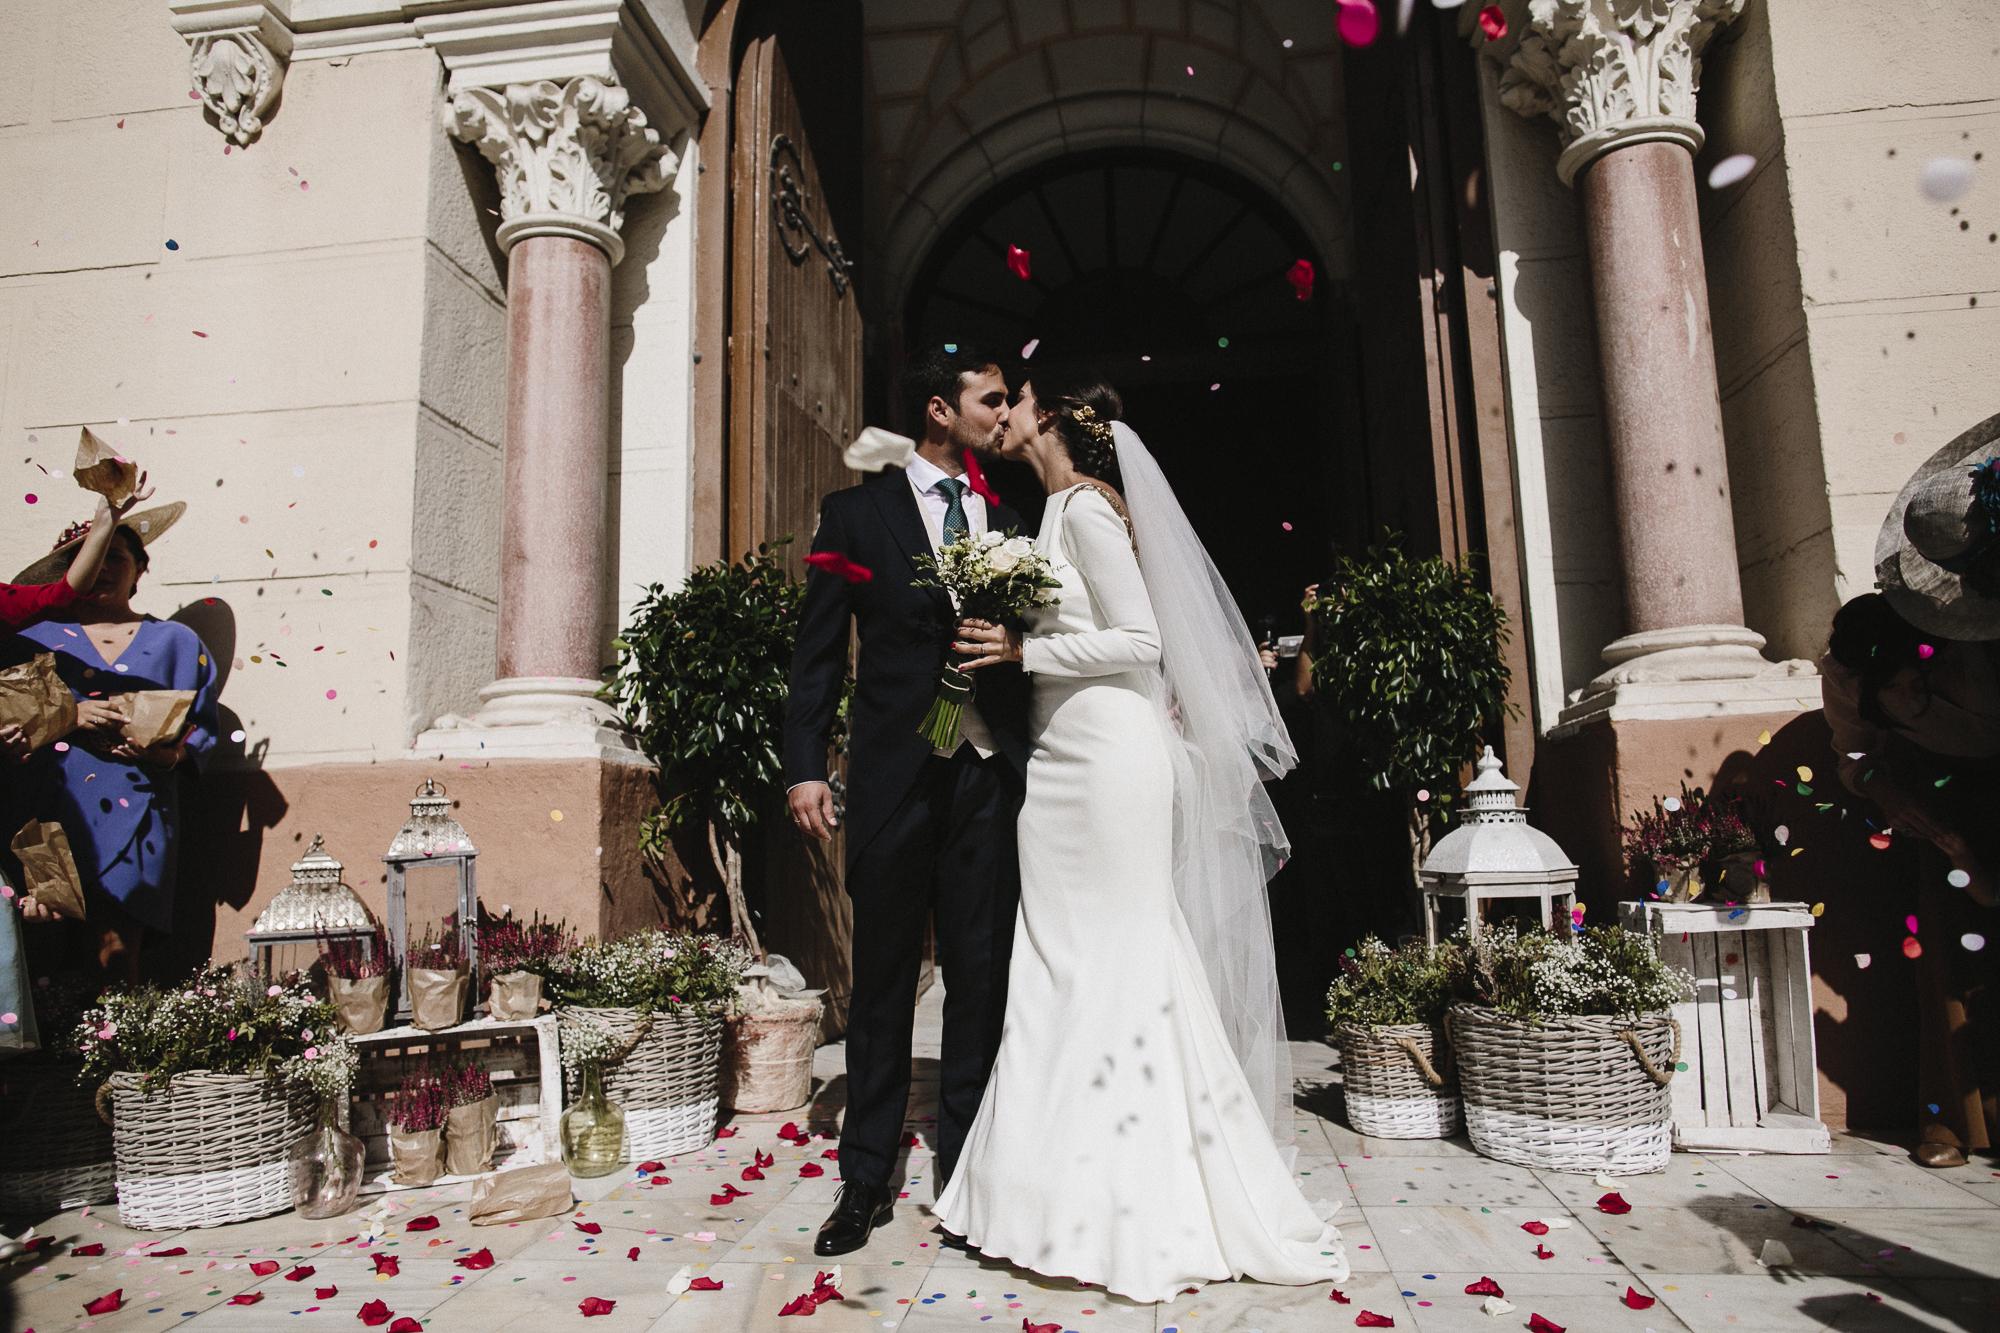 alfonso_flores_destination_wedding_photogrpaher_españa-64.jpg